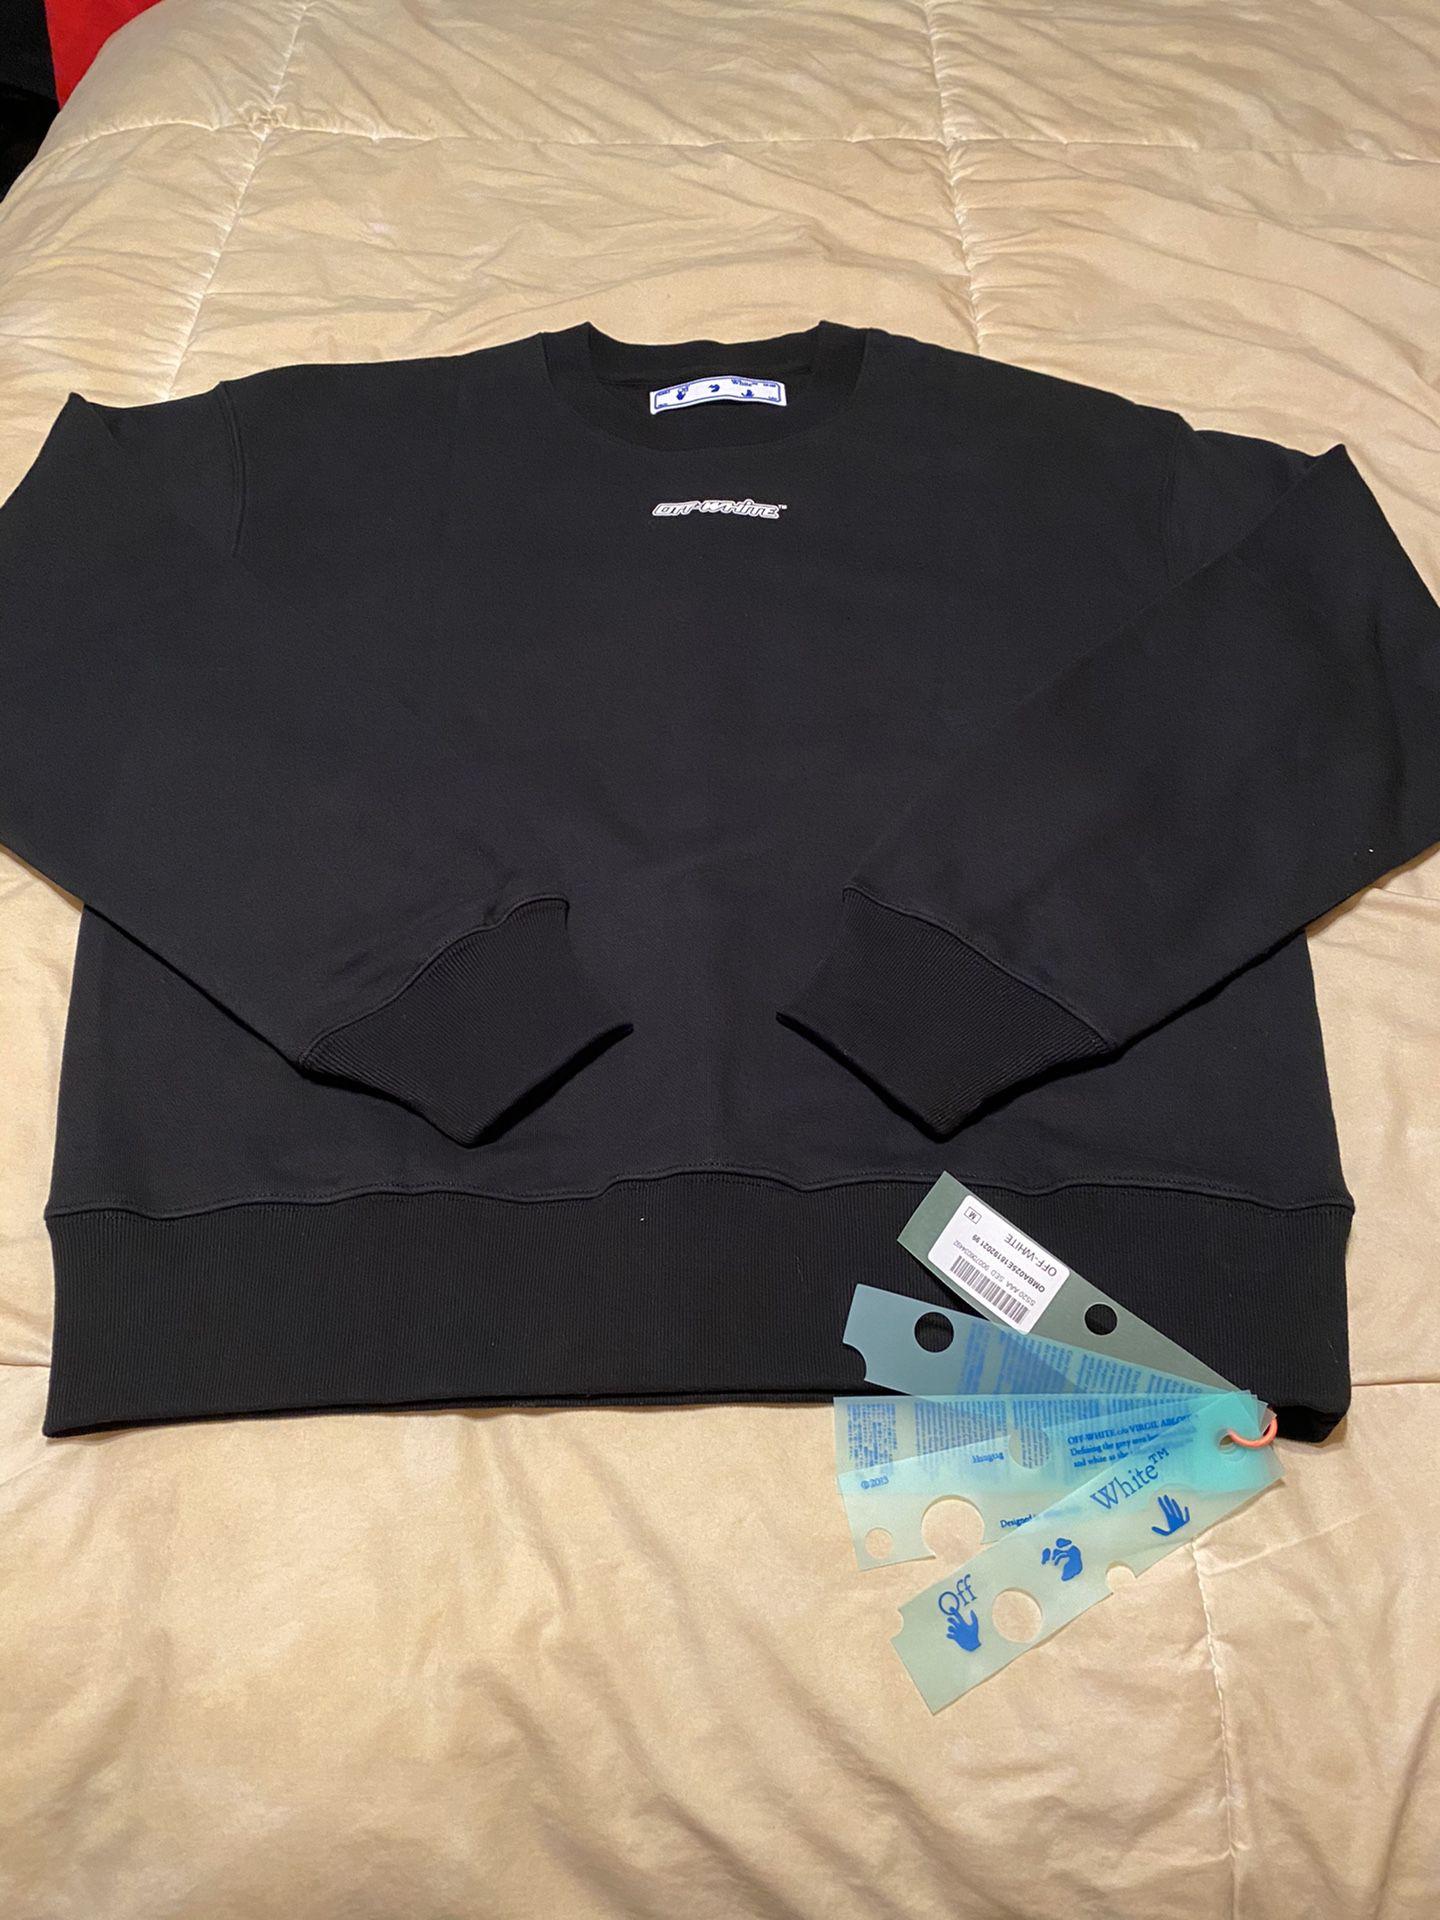 Off white sweatshirt Fits a medium & Large